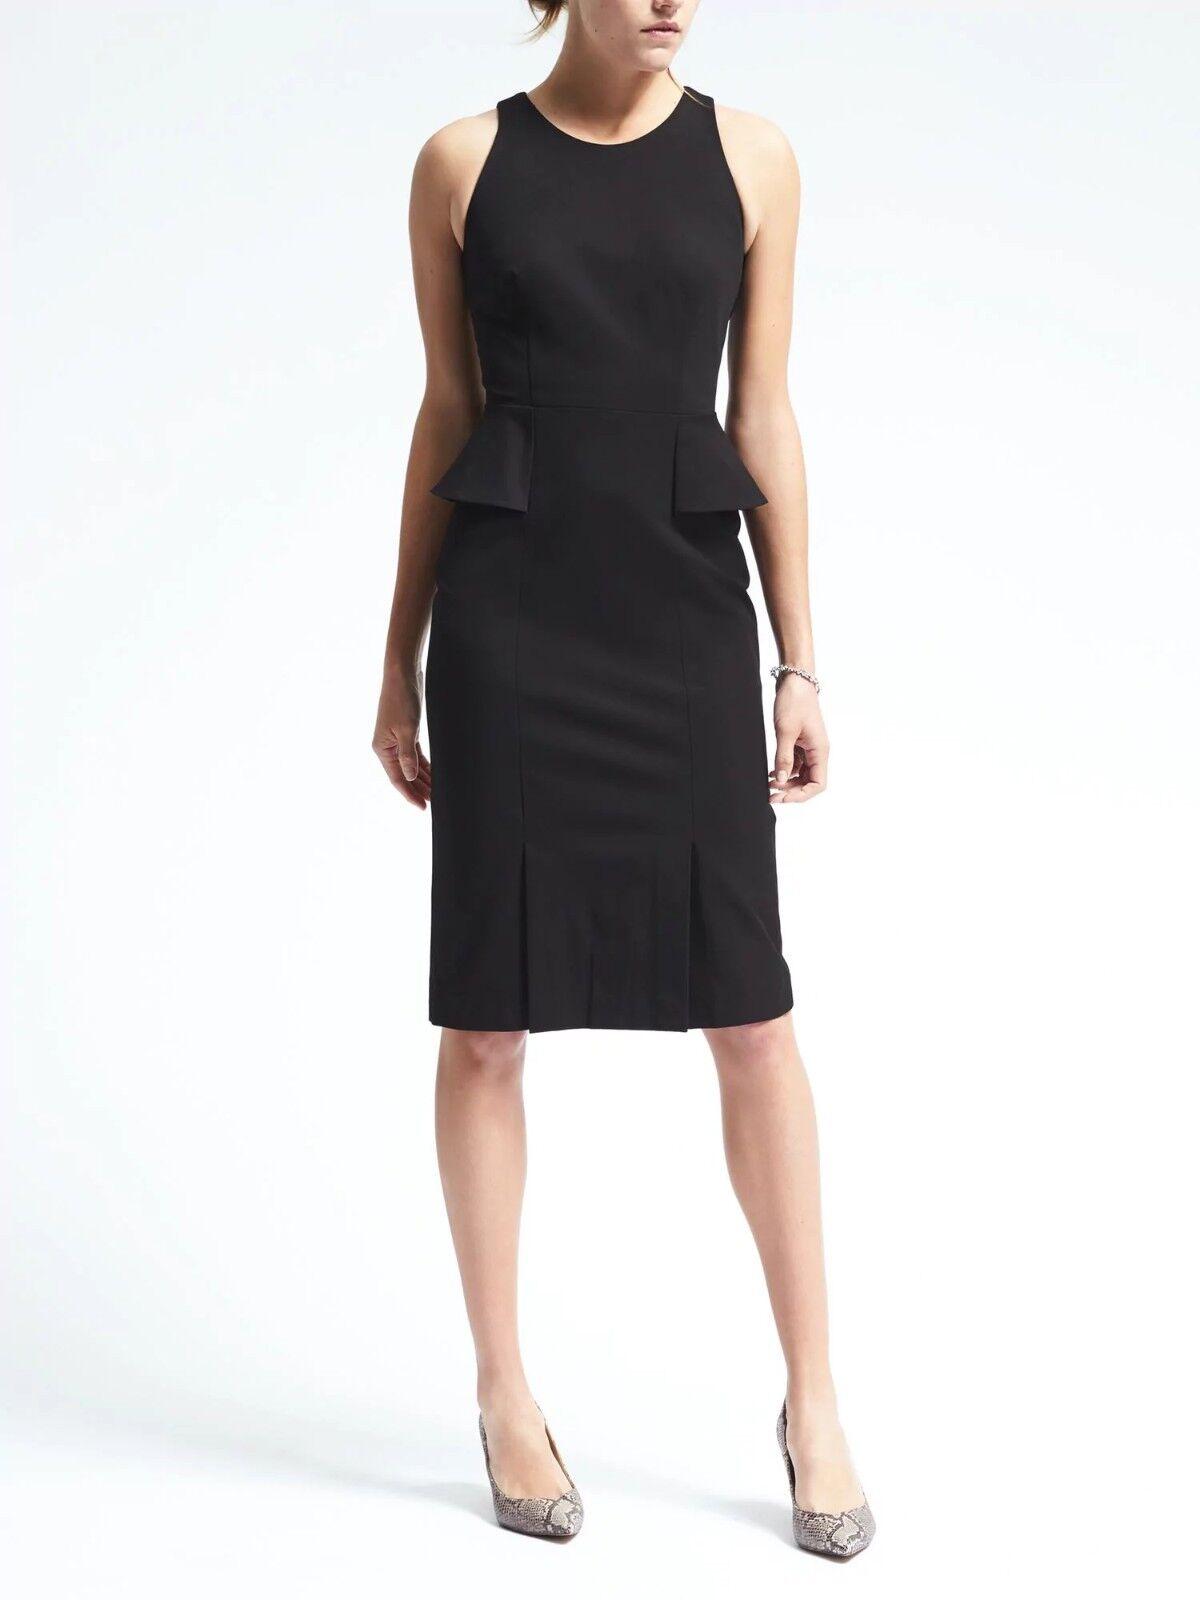 Banana Republic Bi-Stretch Side-Peplum Sheath Dress, schwarz Größe 6   v926